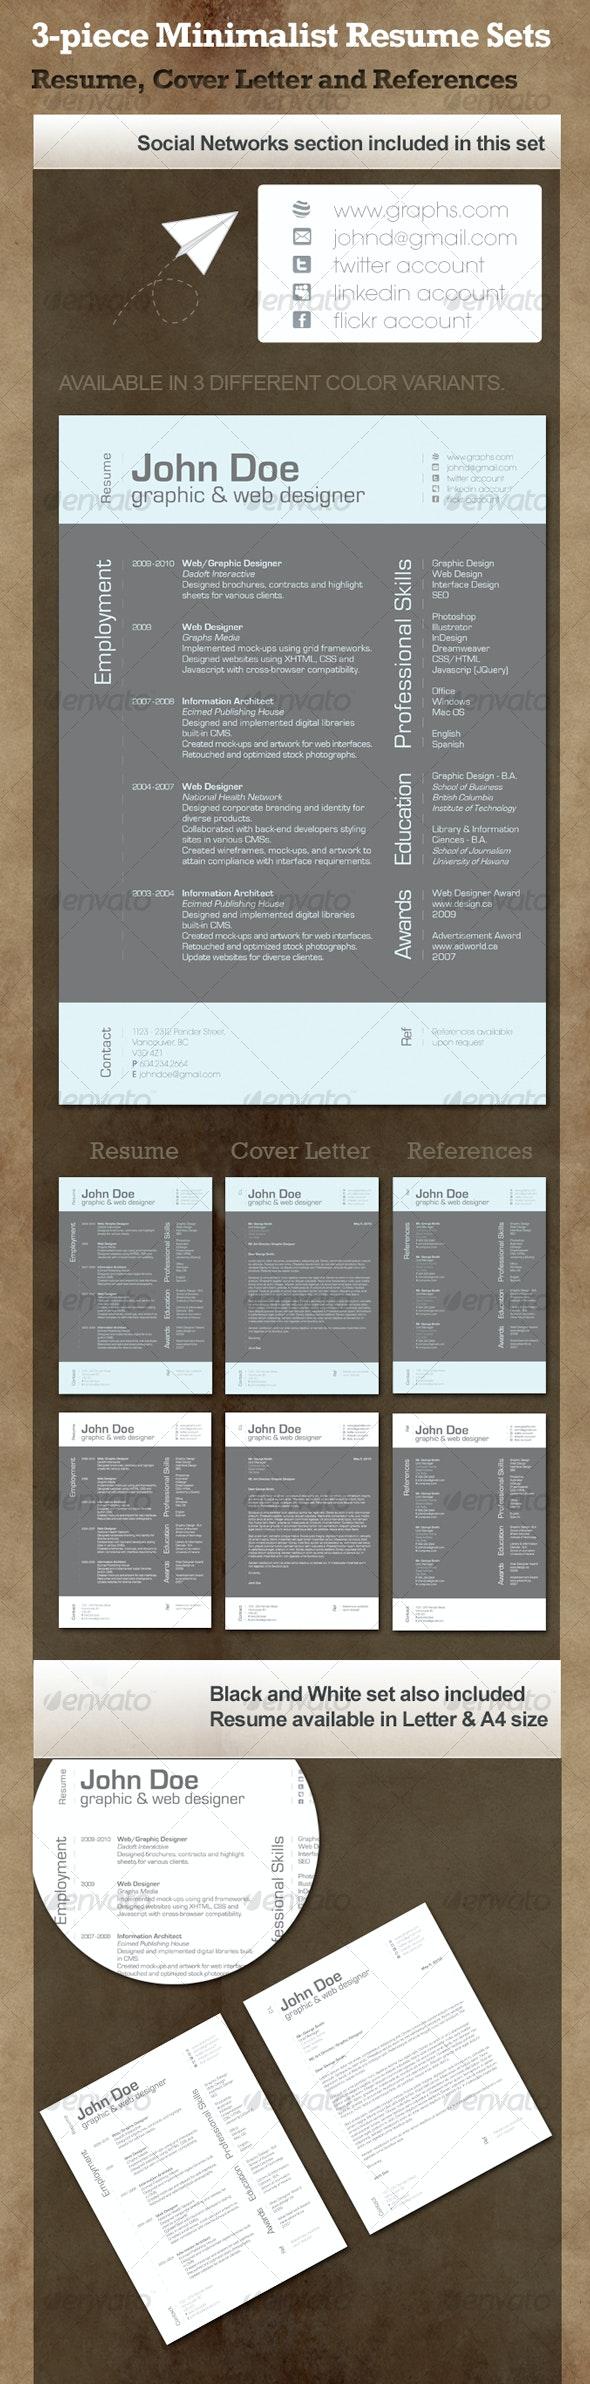 3-Piece Minimalist Resume